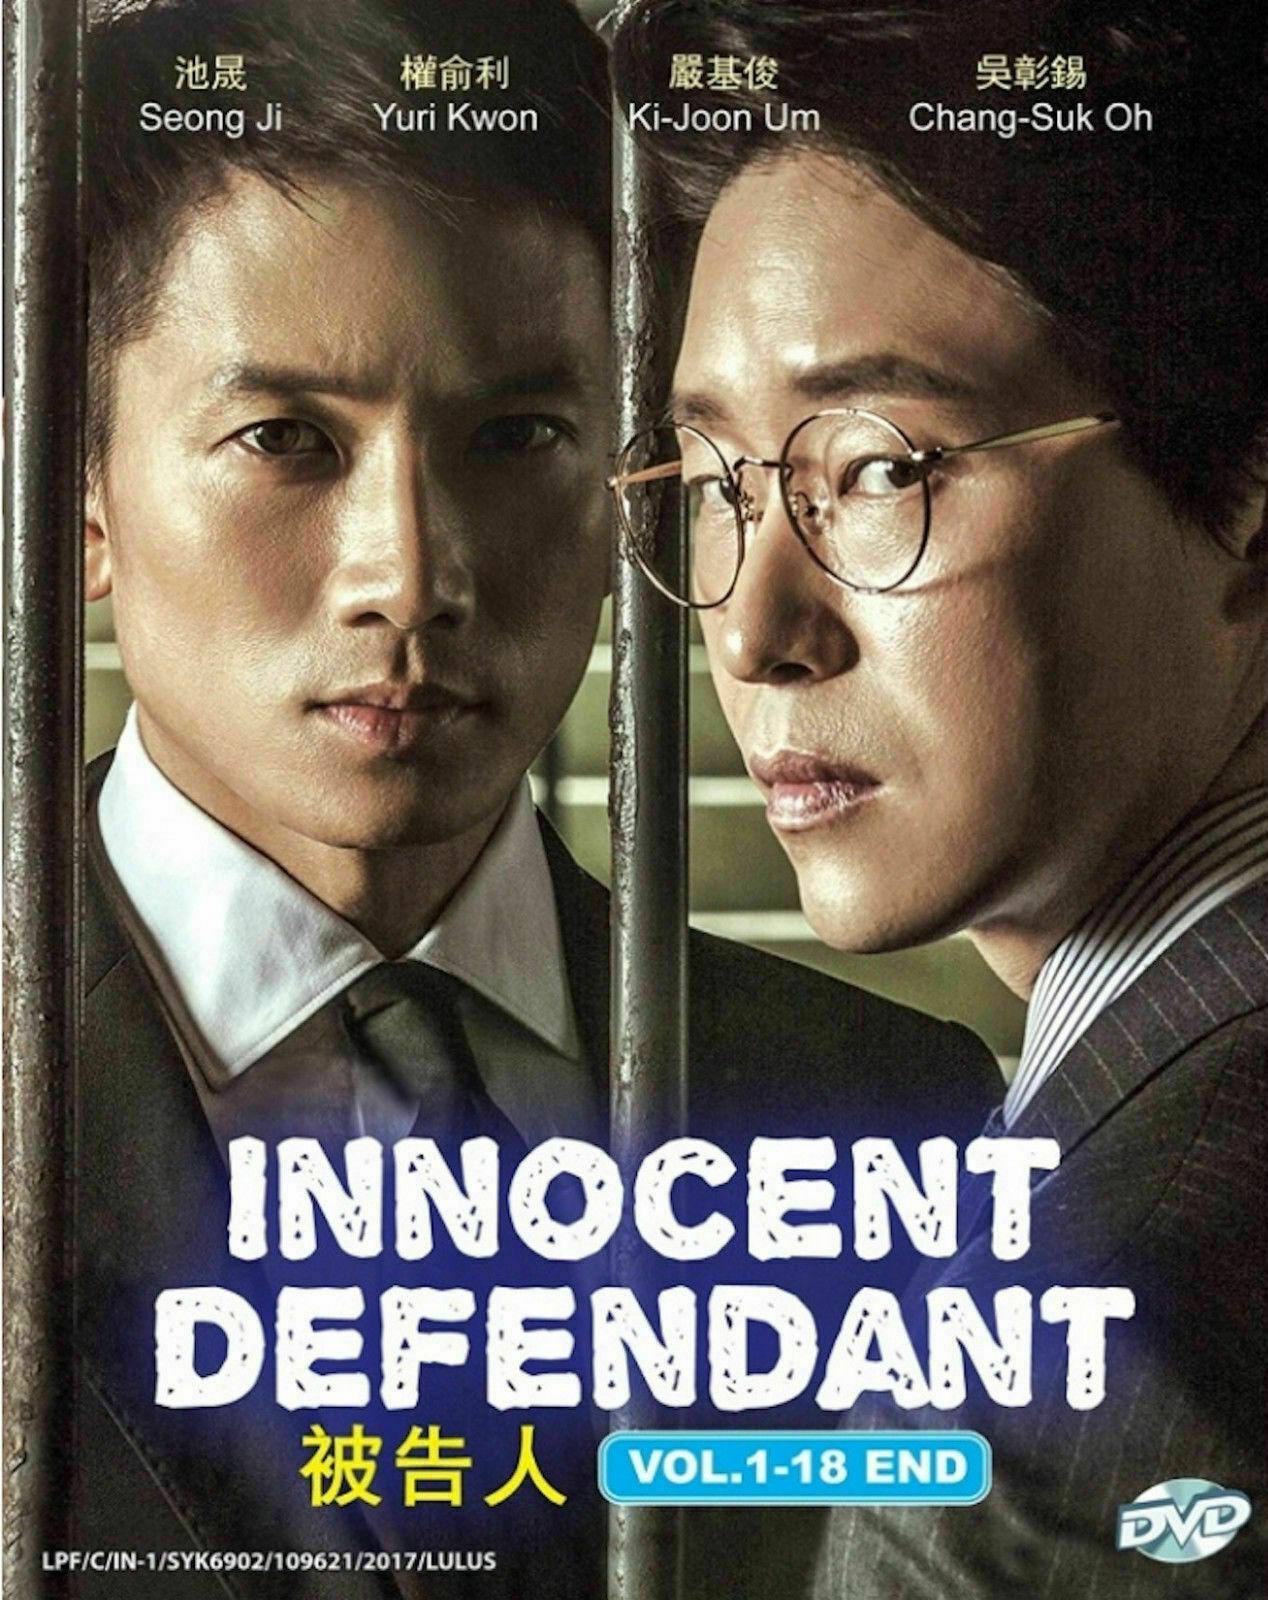 Korean Drama Defendant/Innocent Defendant English Subtitle Box Set Ship From USA